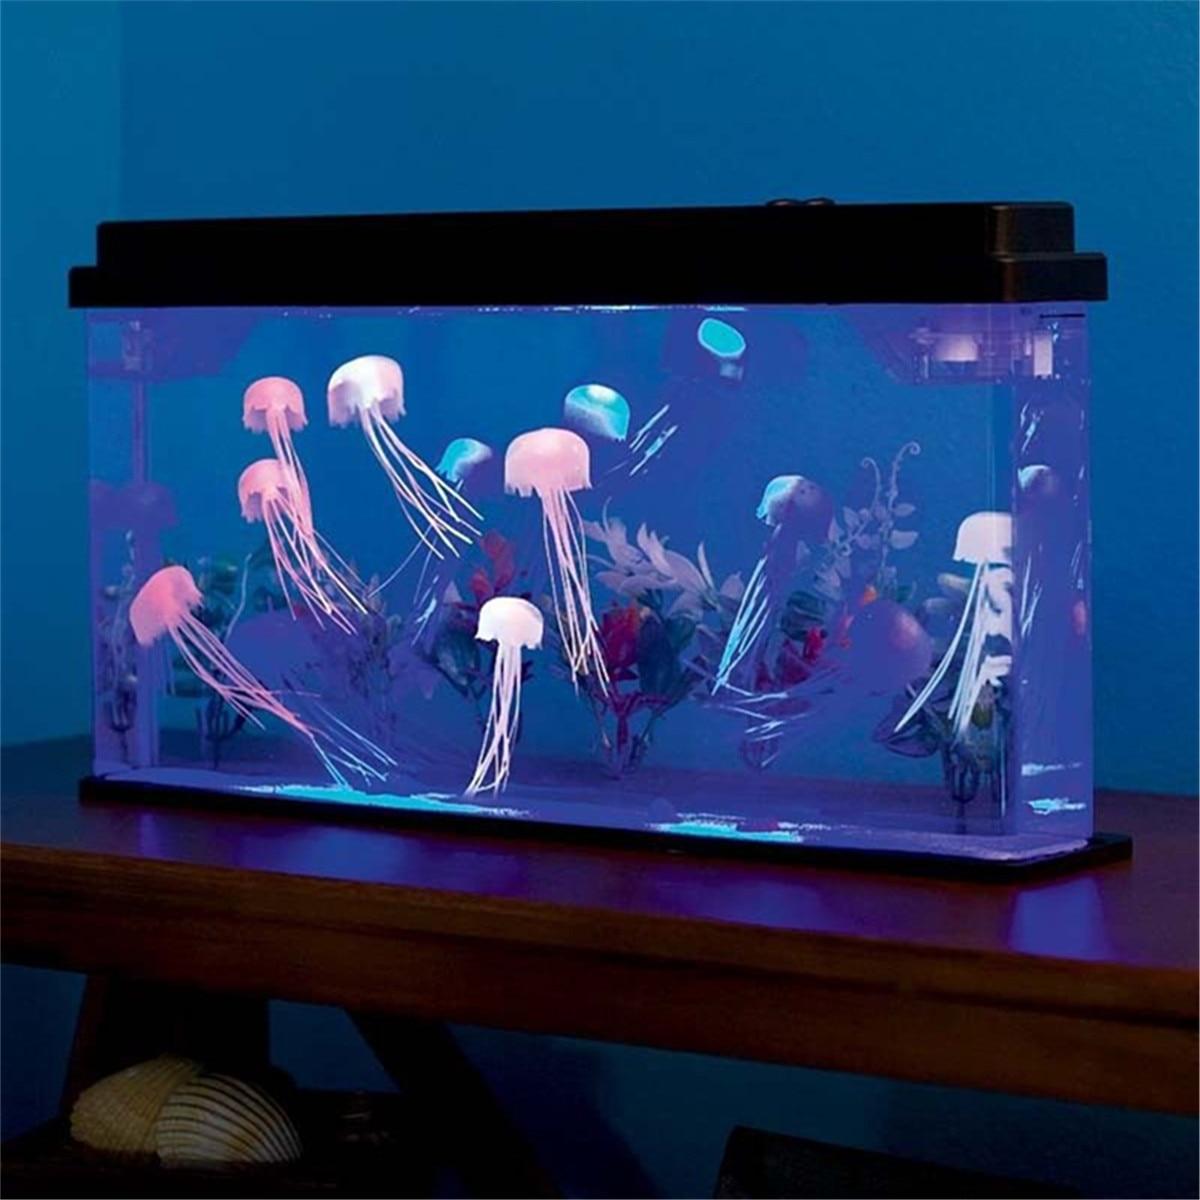 45x8x24cm Jellyfish Deluxe LED Light Glowing Aquarium Fish PetsTank Home Decor Underwater World Background Household